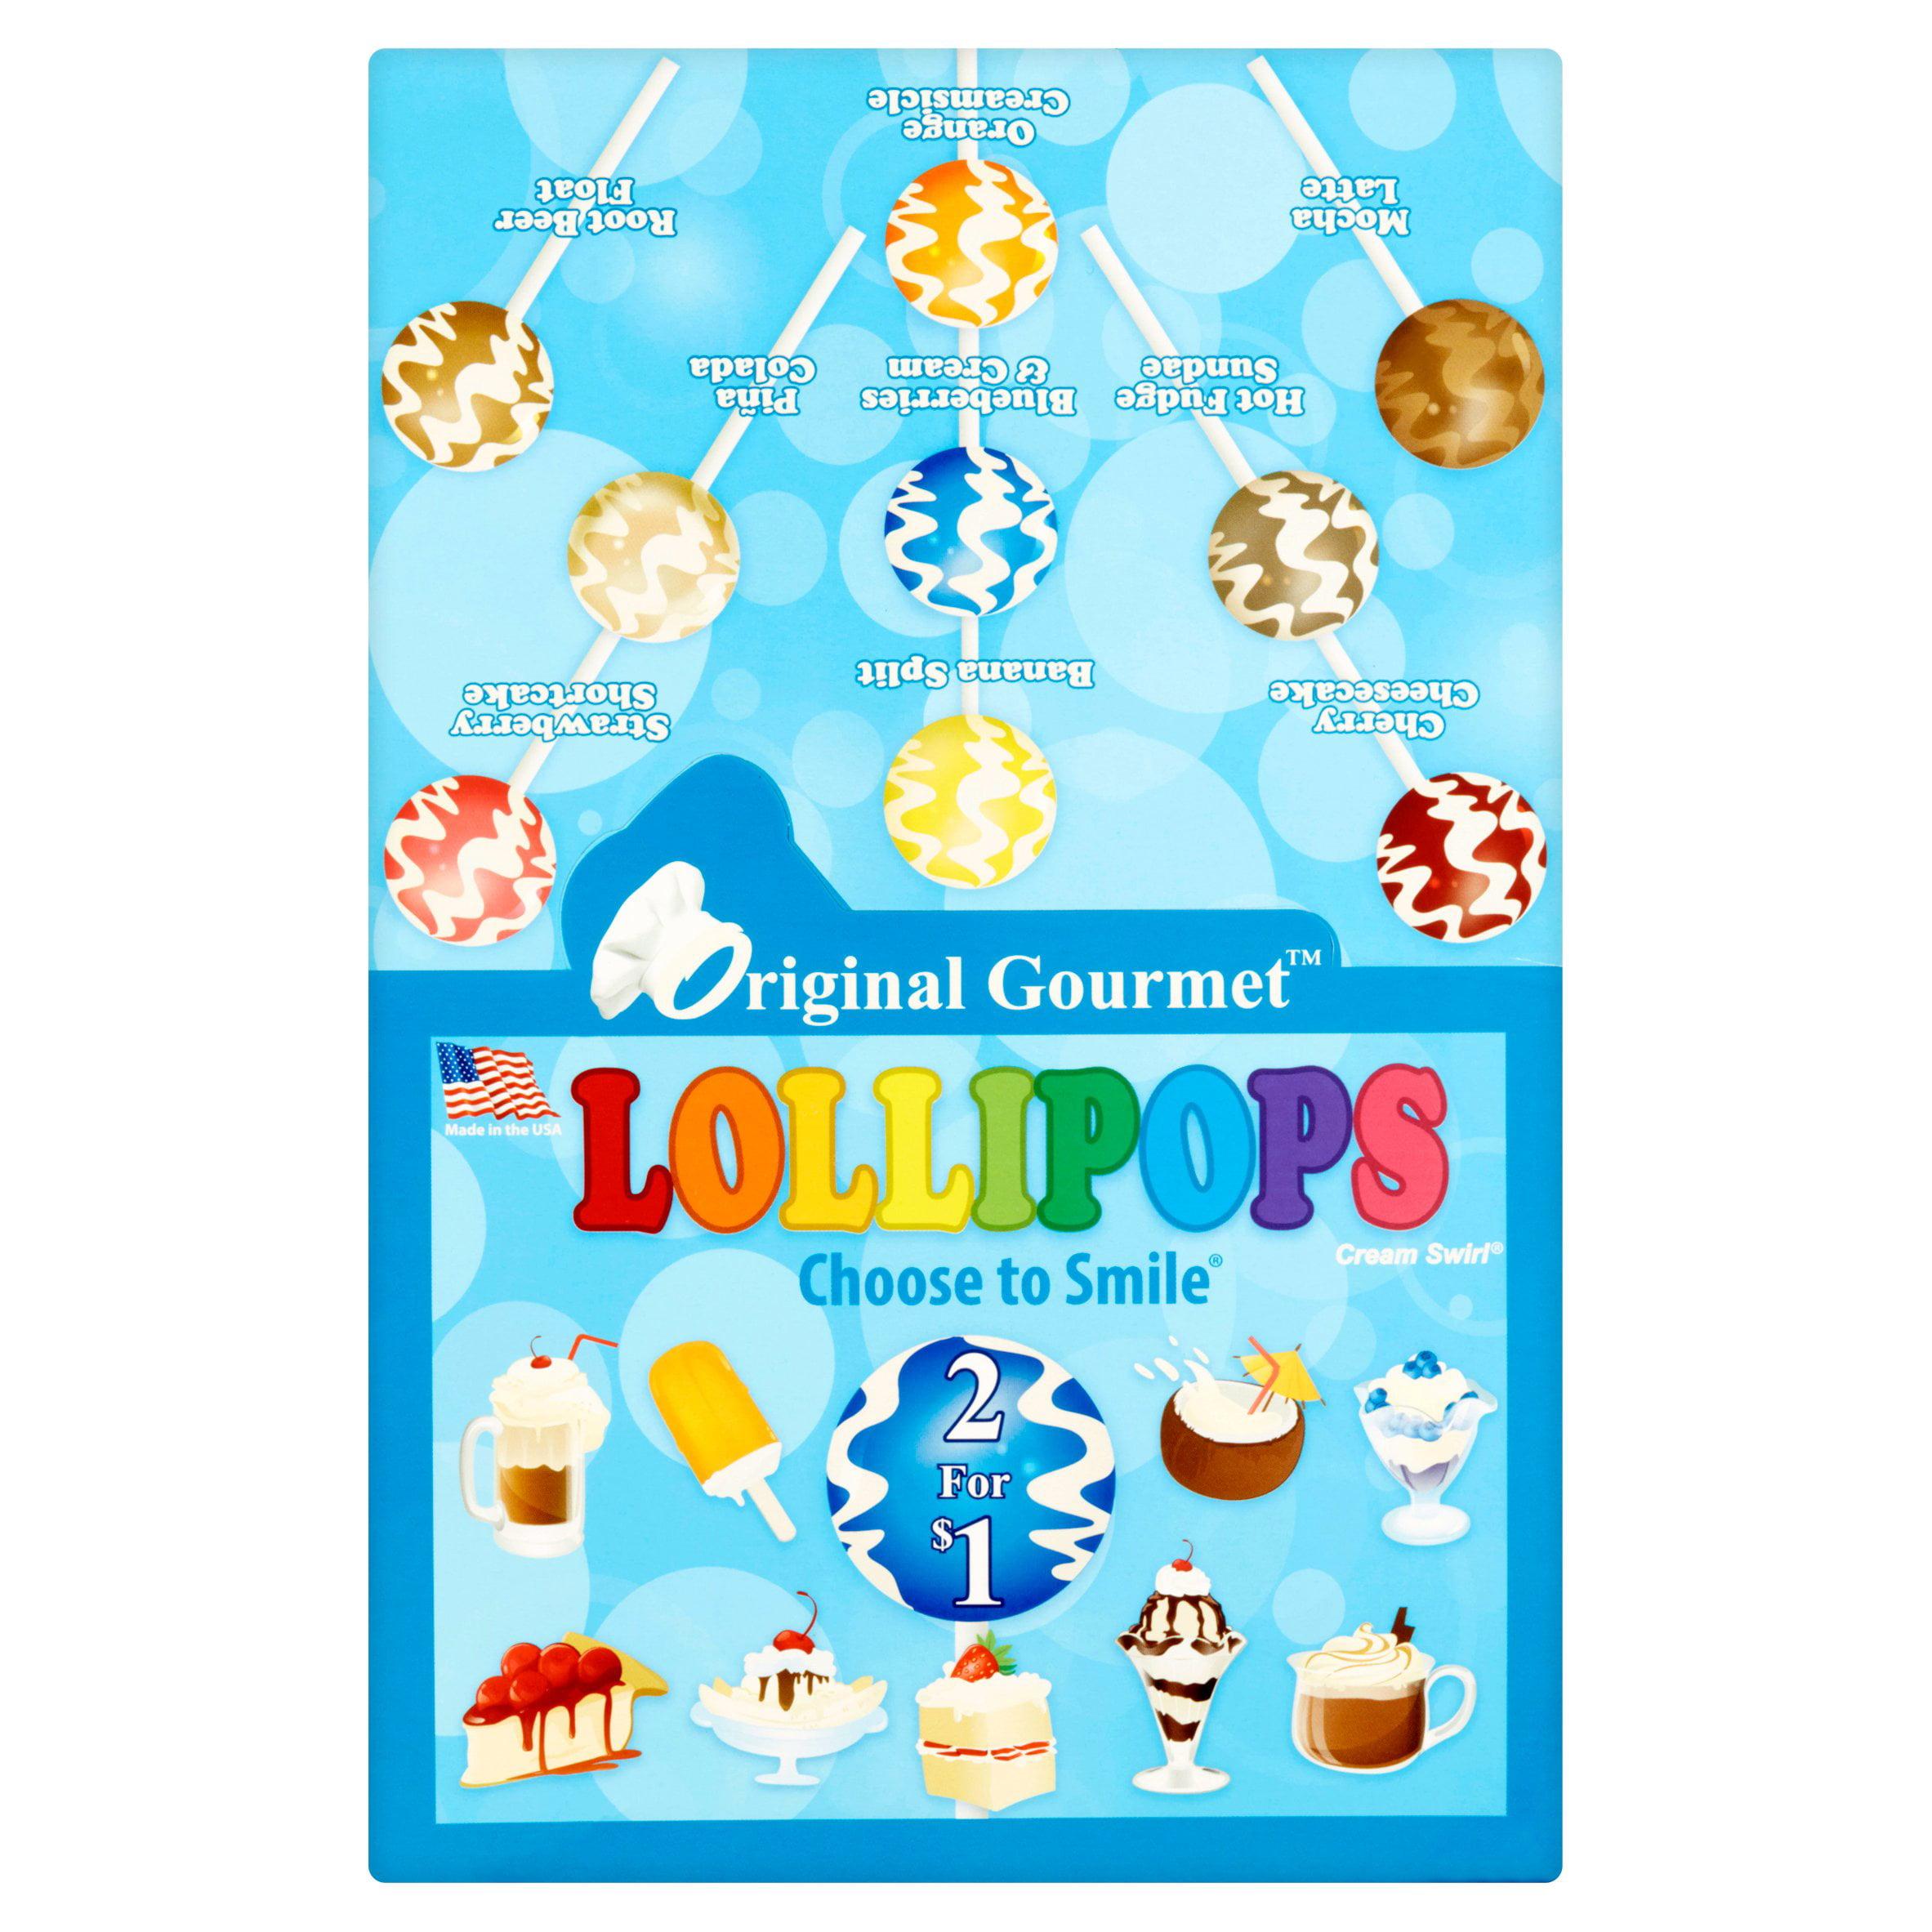 Original Gourmet Cream Swirl Lollipops, 1.1 oz, 48 count